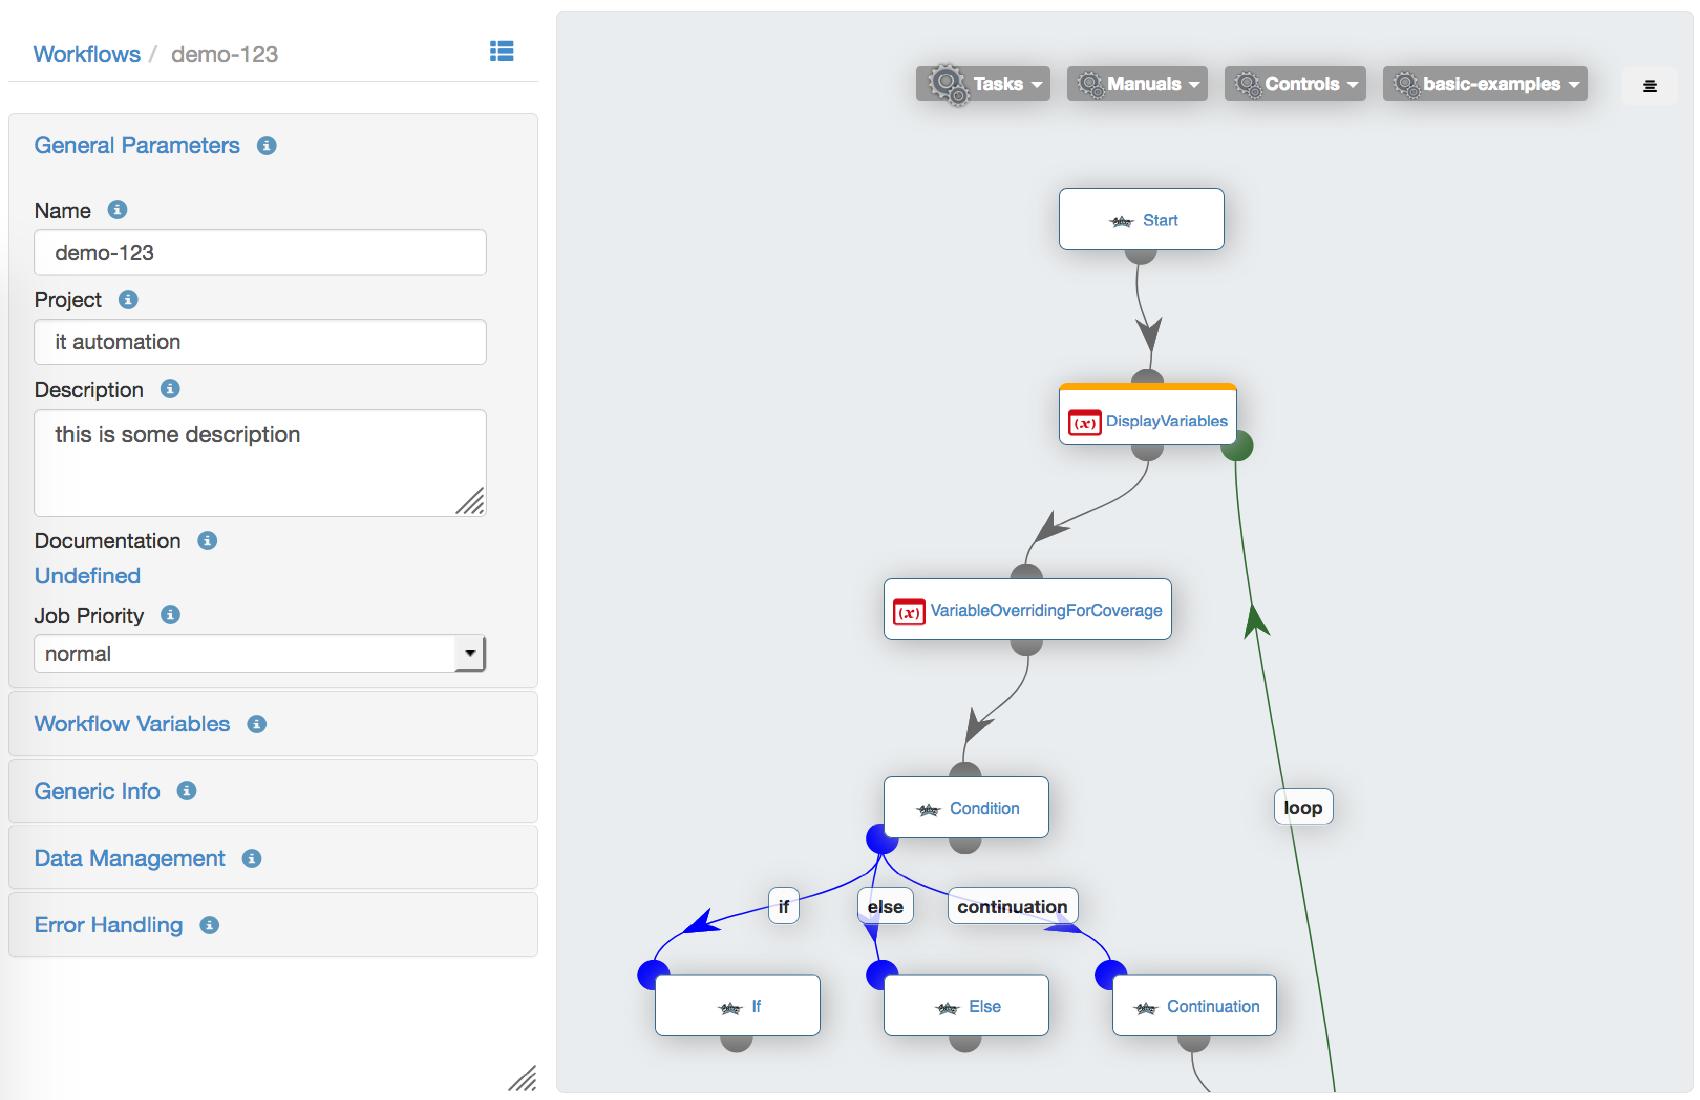 images/product-screenshots/proactive-workflow-studio.png